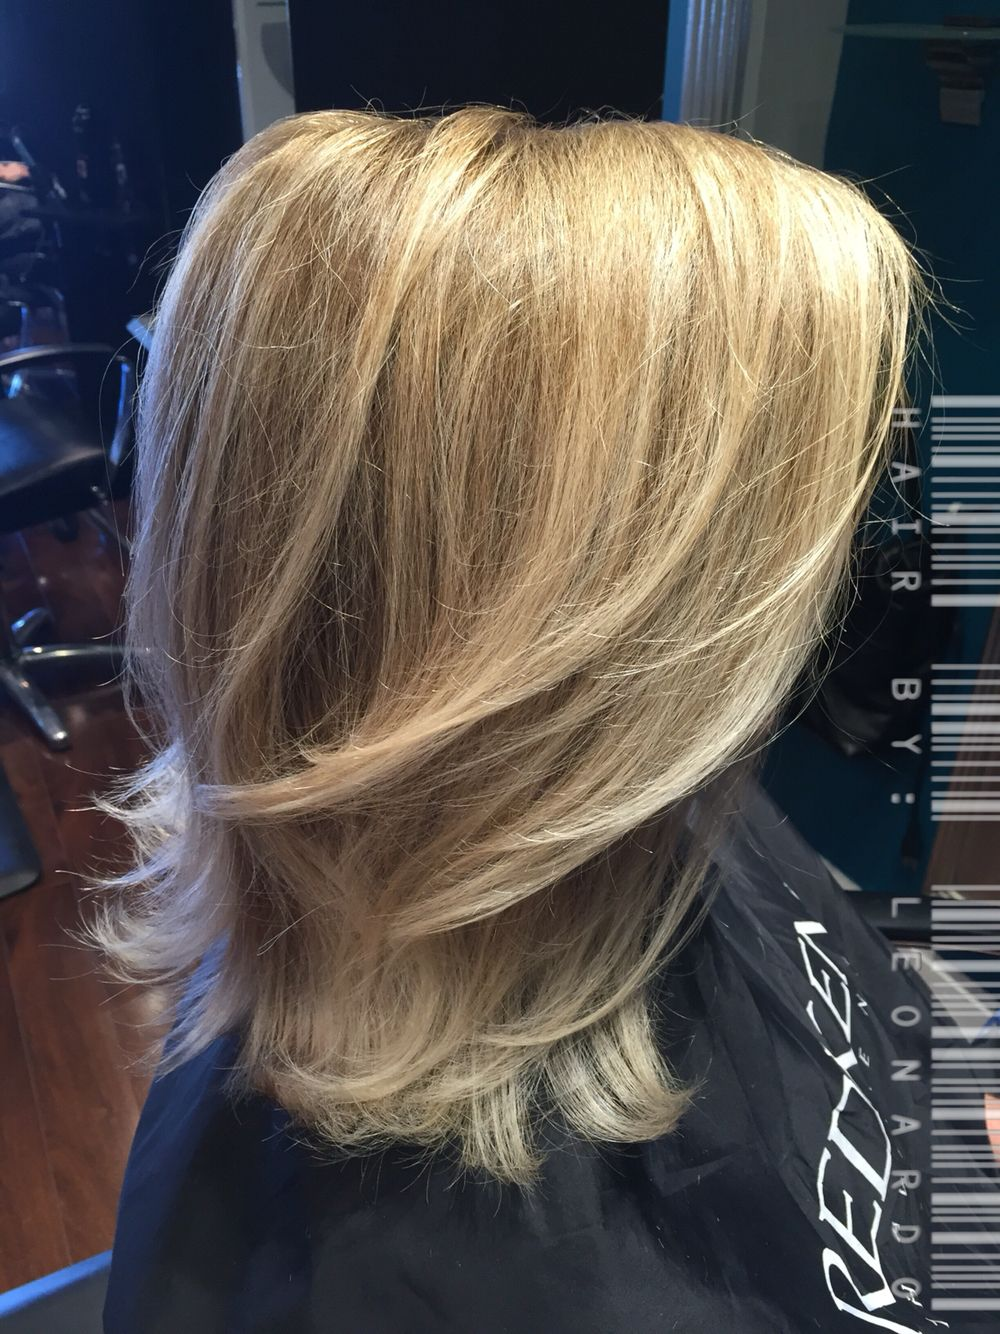 balayage hair color by leonardo martinez @ salon siren in tampa,fl